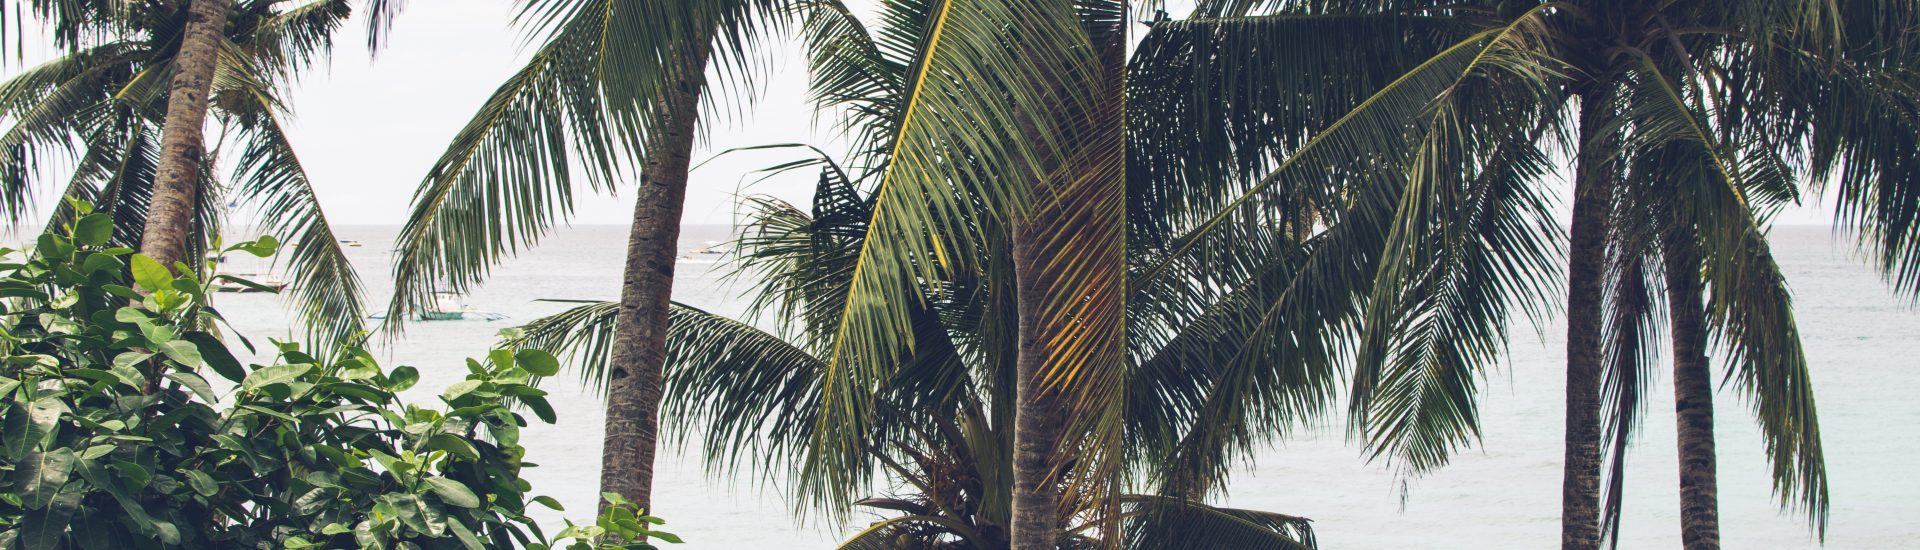 Palmen auf Boracay